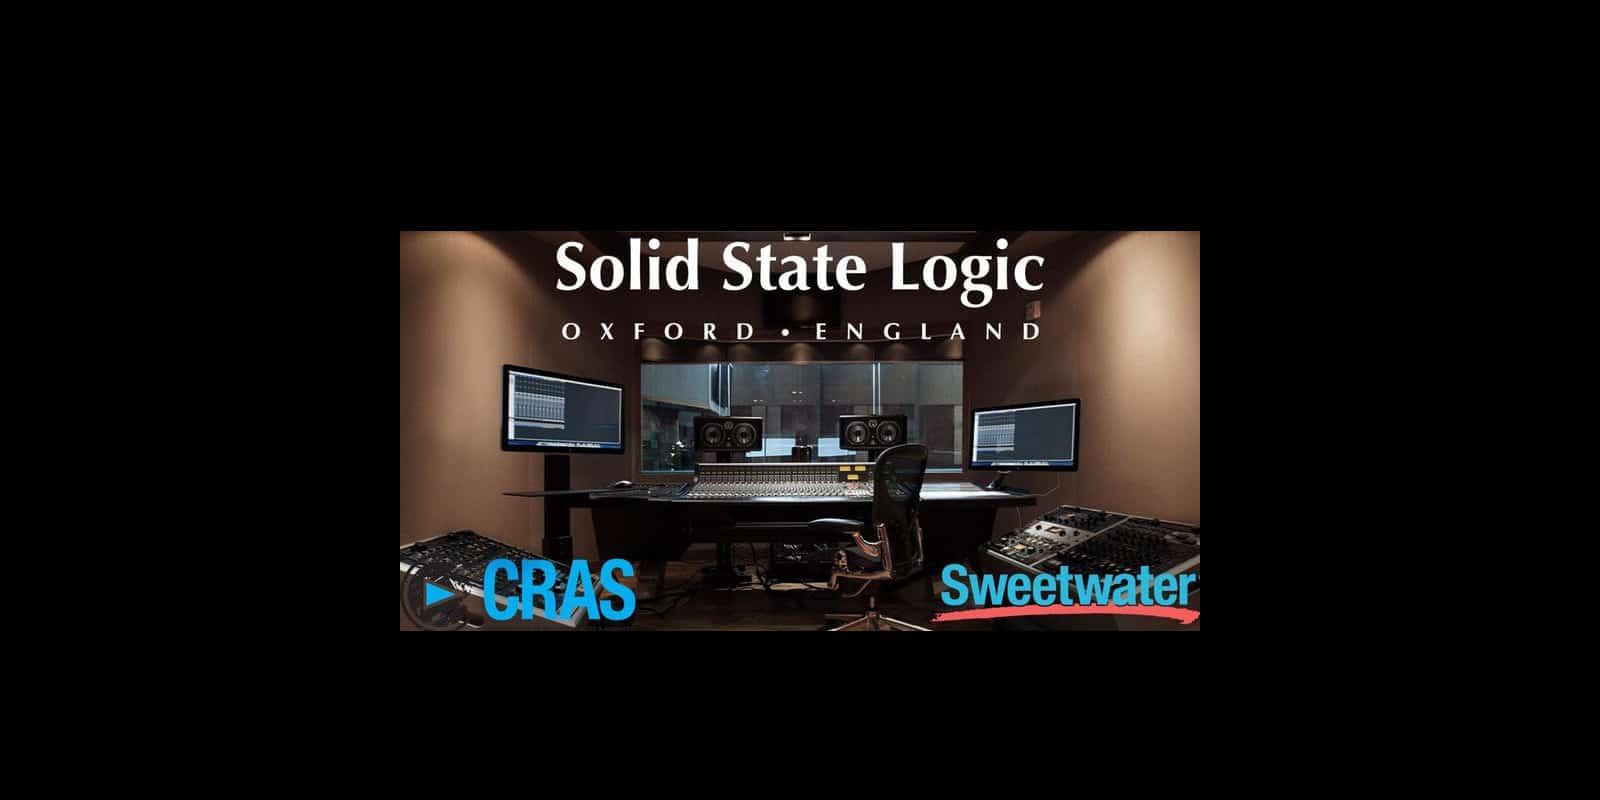 CRAS Hosts an Evening with Legendary Pro Audio Console Manufacturer SSL